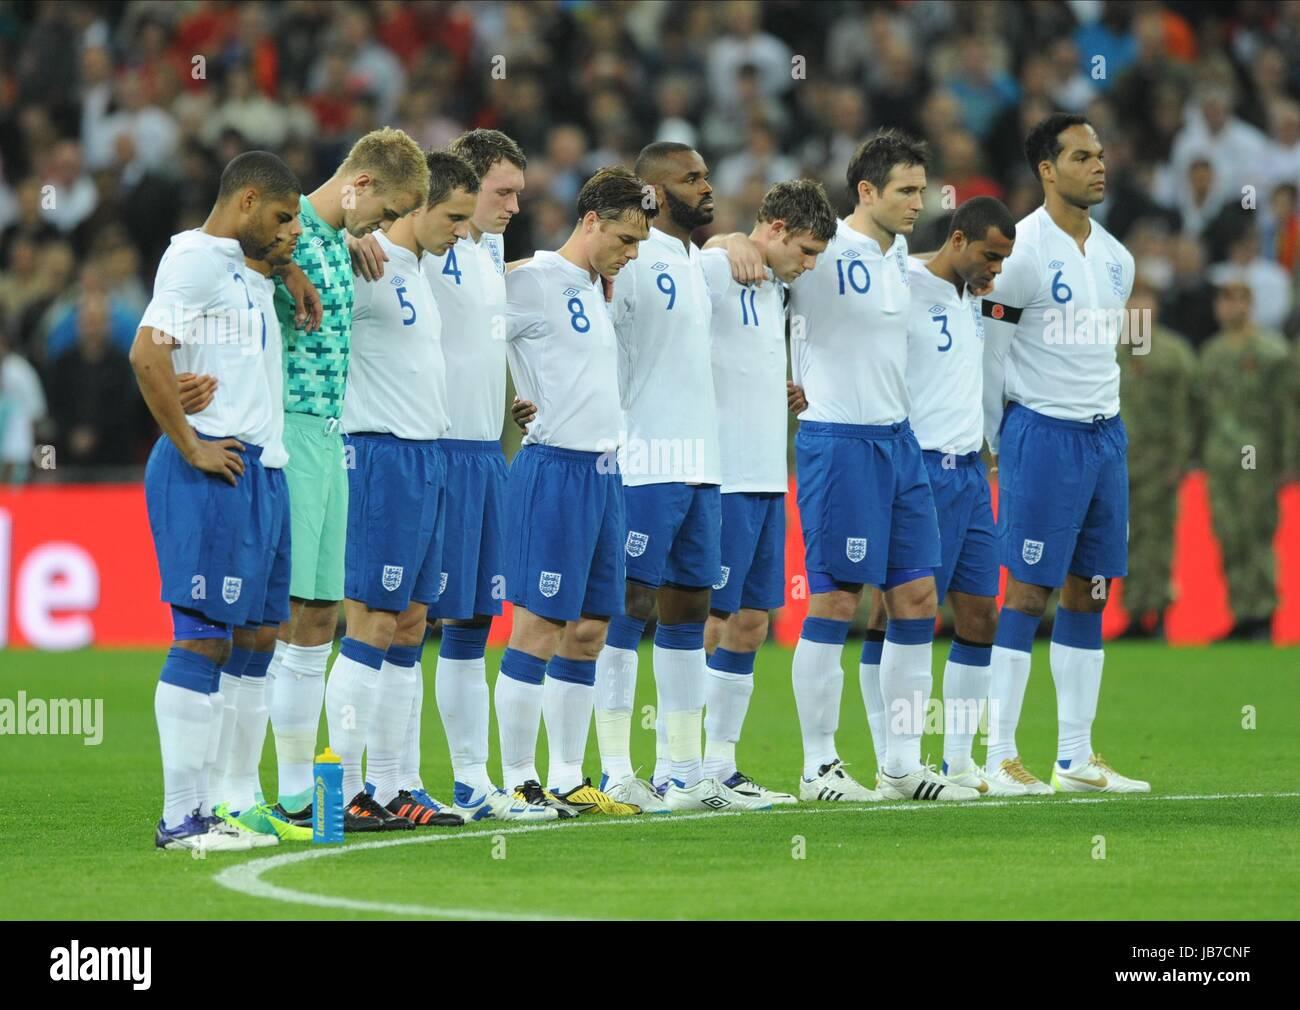 THE ENGLAND TEAM OBSERVE THE M ENGLAND V SPAIN WEMBLEY STADIUM LONDON ENGLAND 12 November 2011 - Stock Image